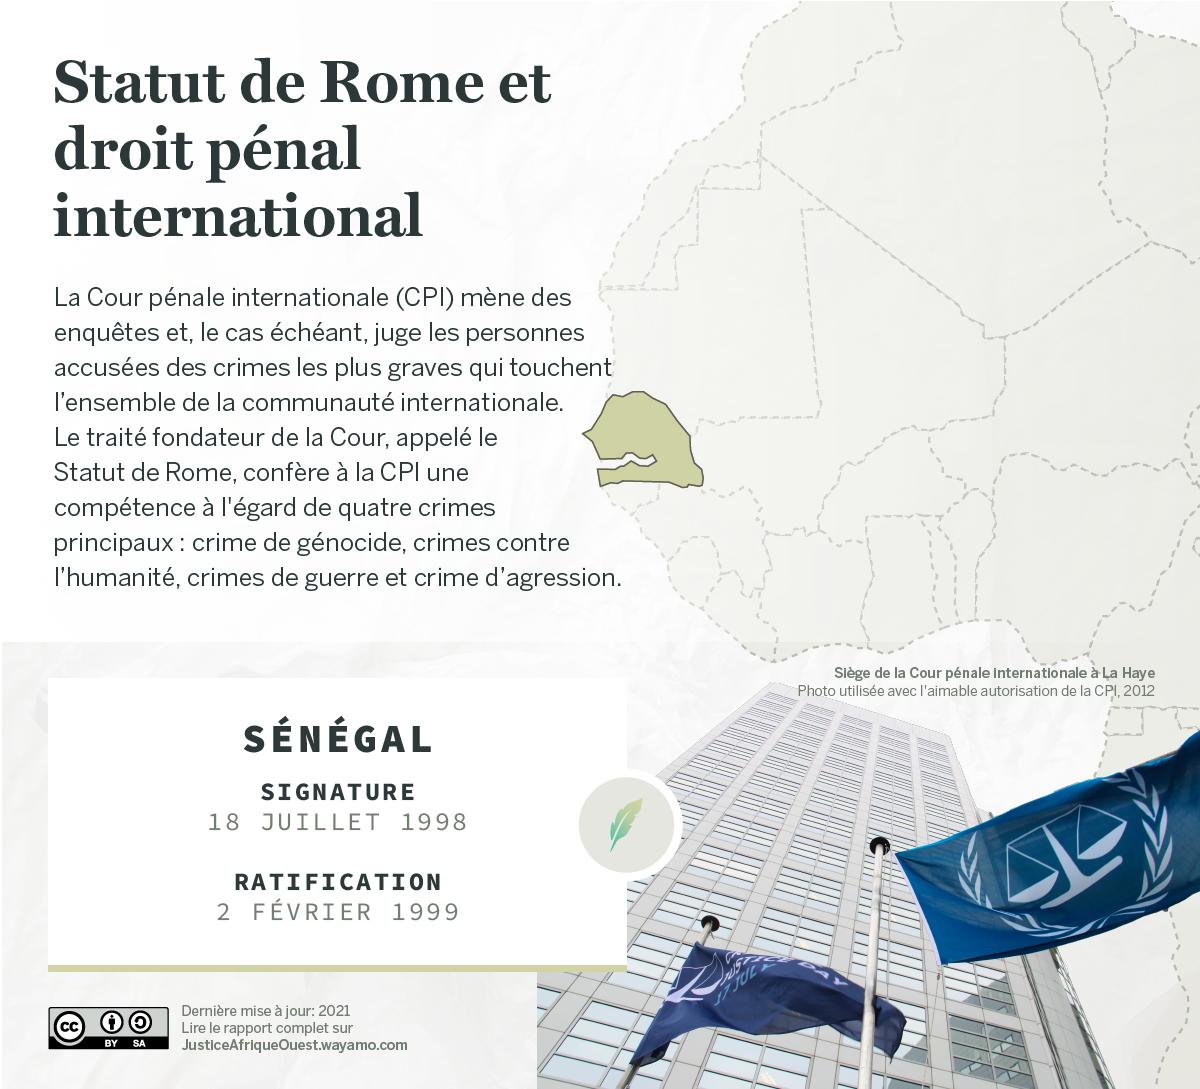 SENEGAL_Statut de Rome - Wayamo Foundation (CC BY-SA 4.0)